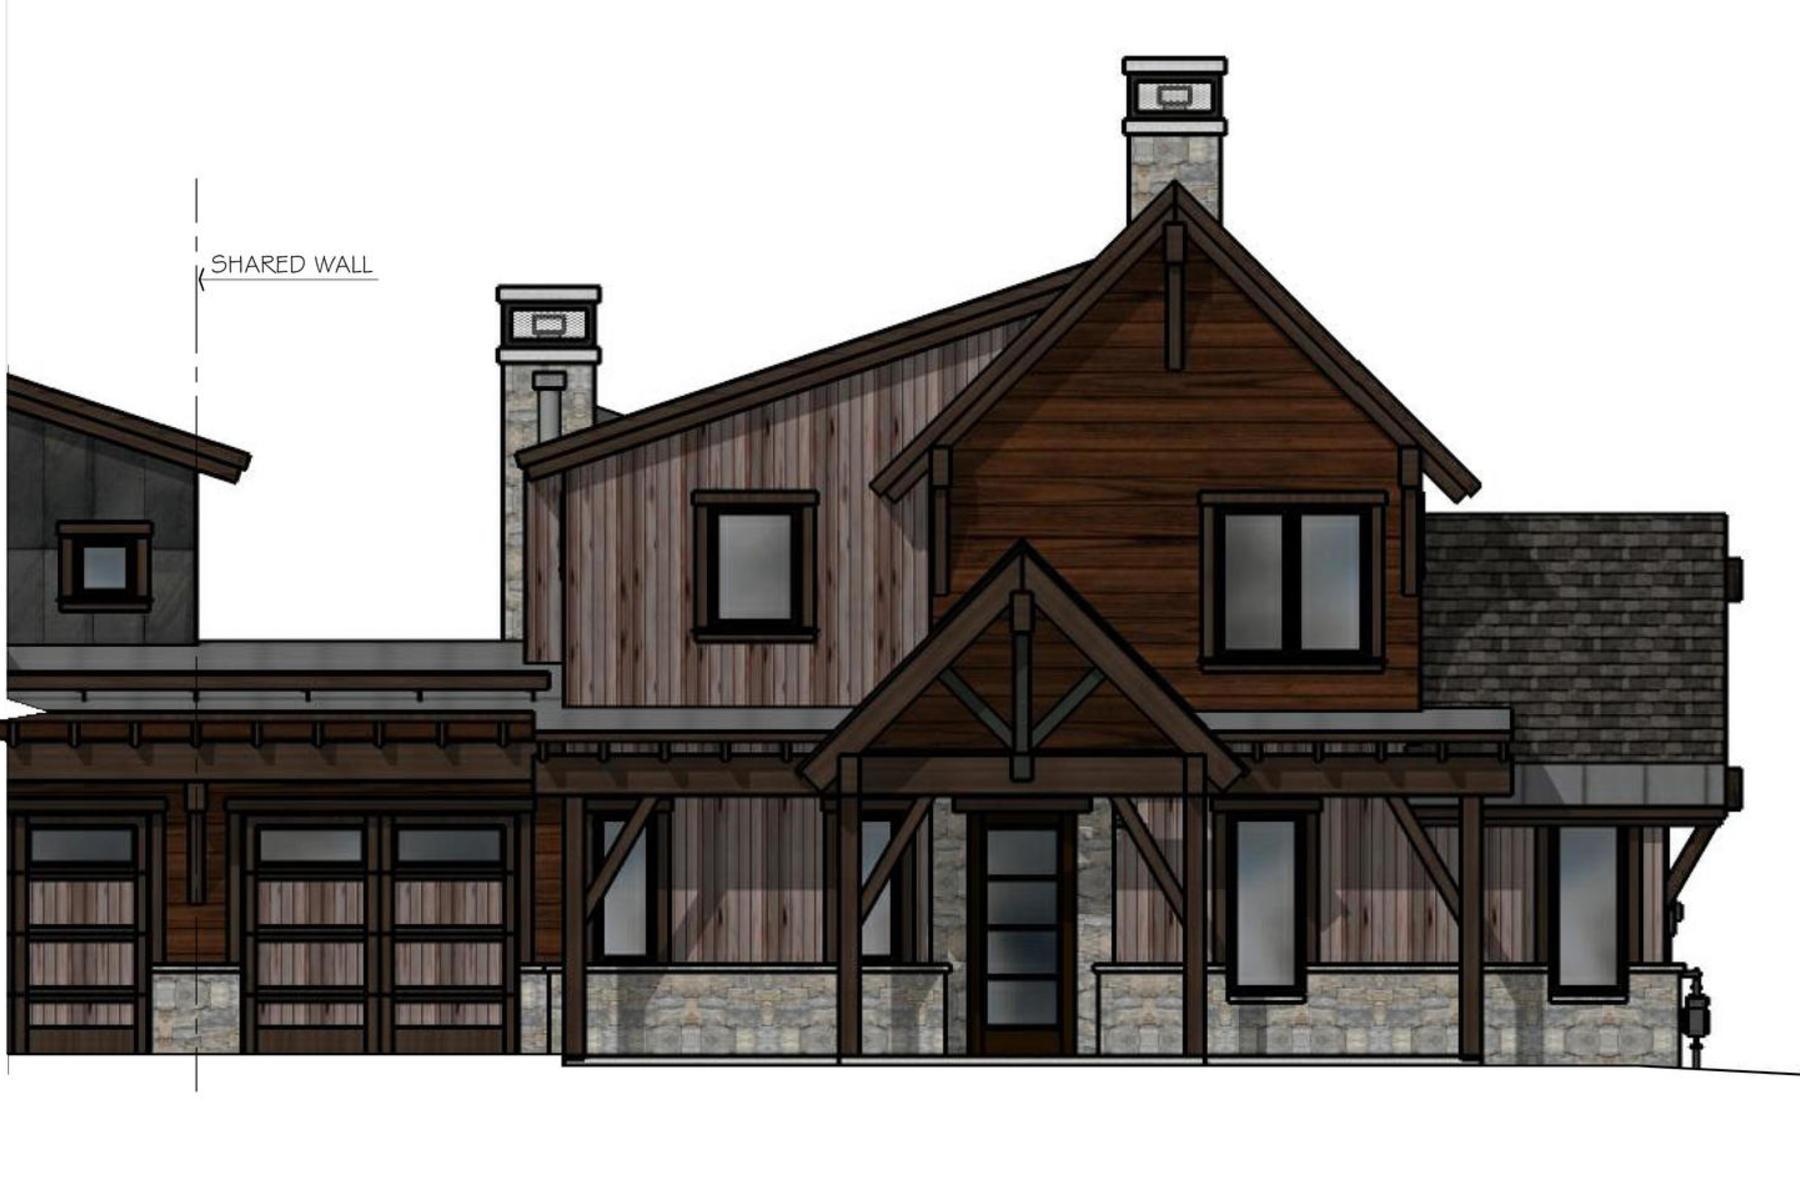 Duplex Homes για την Πώληση στο Lot 14 in Waters at Silver Trout 572 Fly Line Drive, Silverthorne, Κολοραντο 80498 Ηνωμένες Πολιτείες